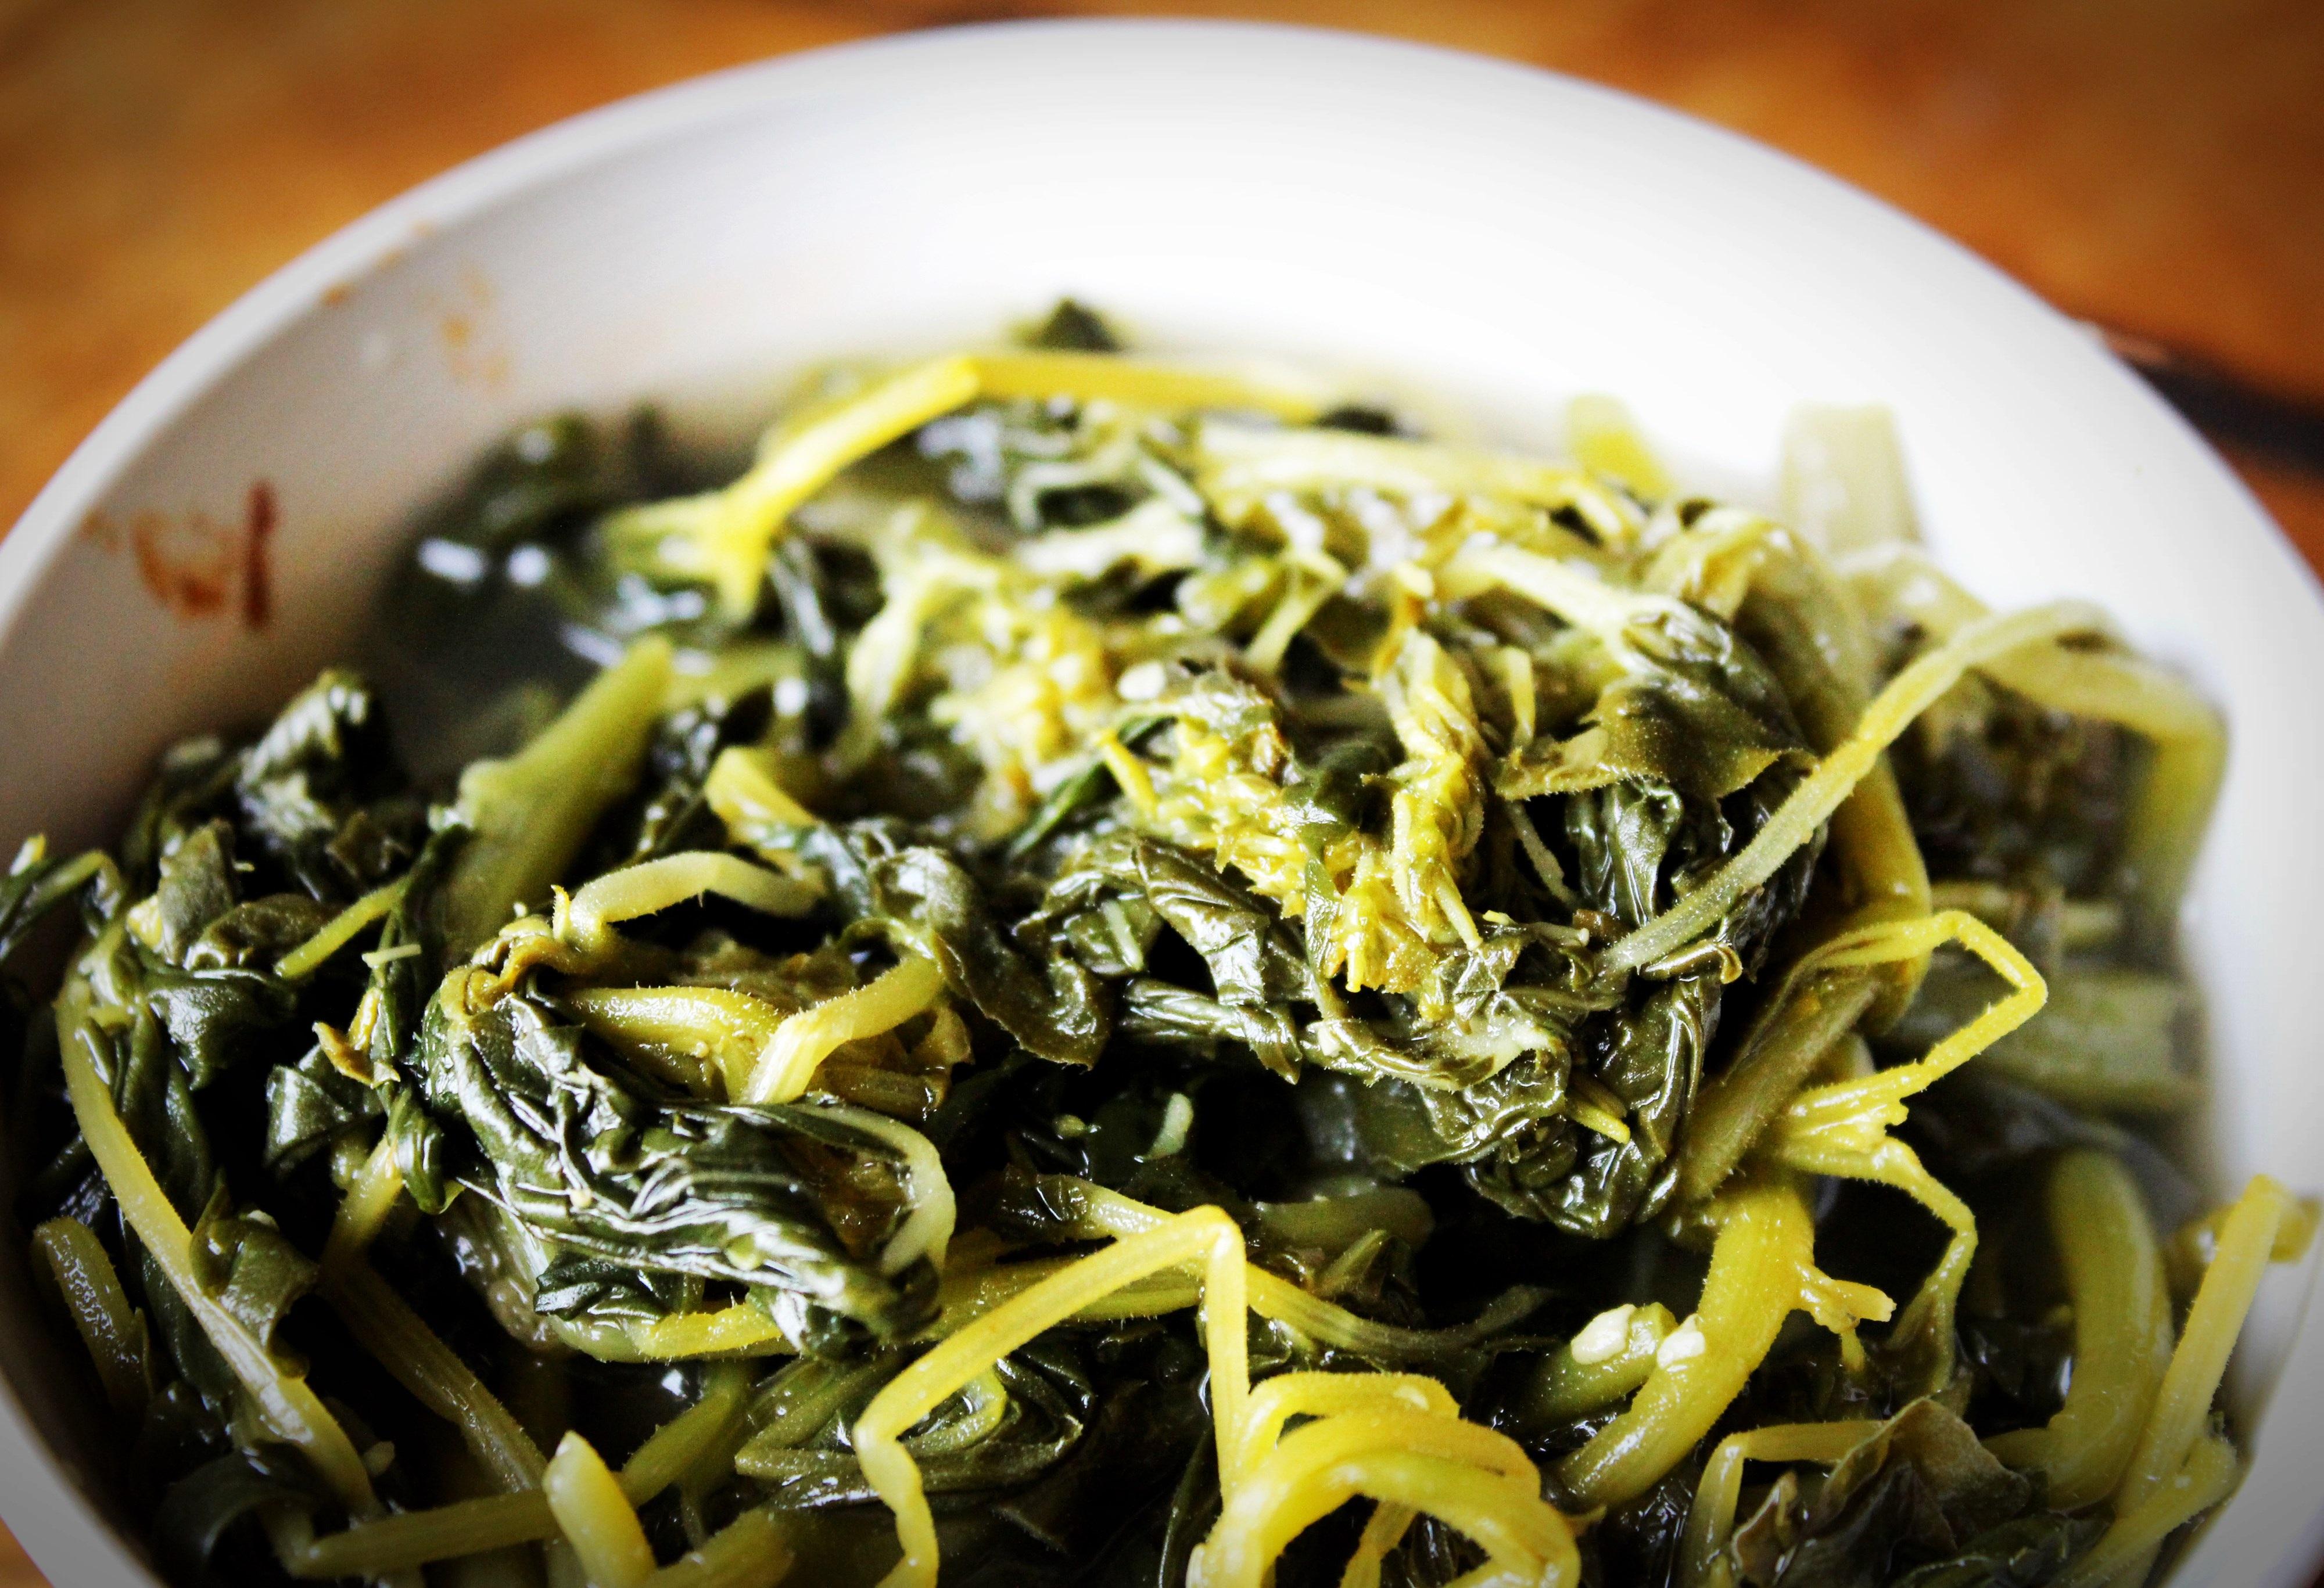 Free dish salad pepper chili ingre nt herb